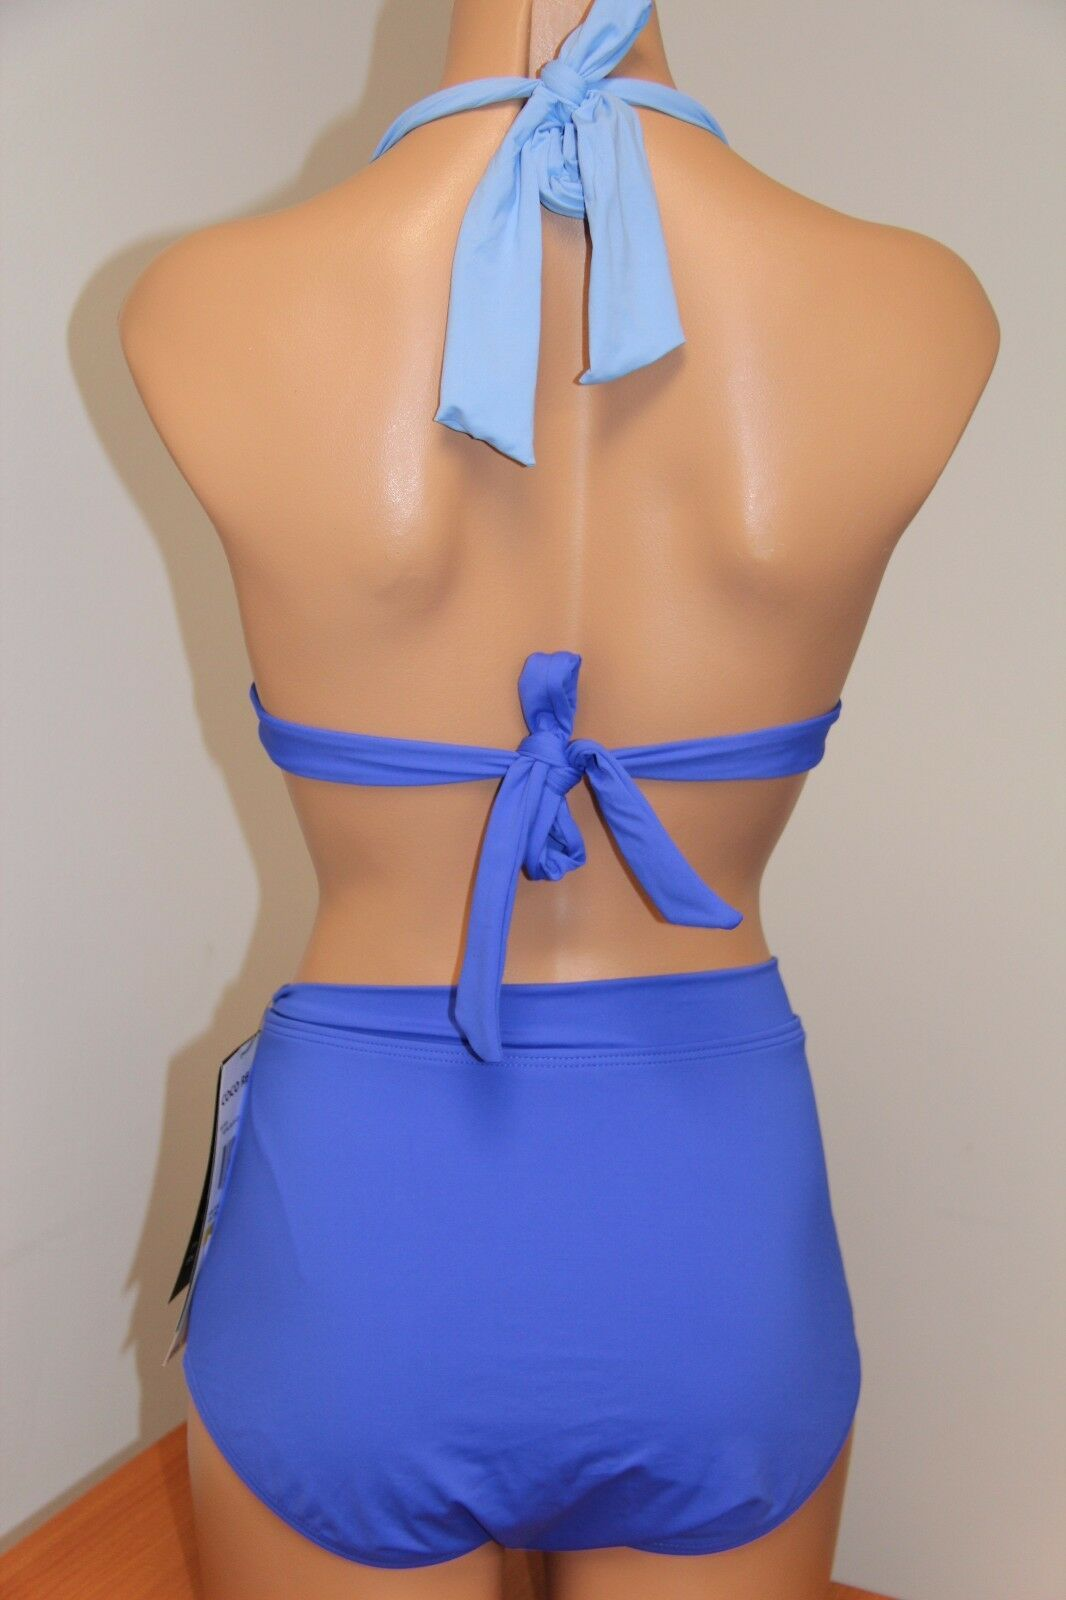 NWT Coco Reef Swimsuit Bikini 2pc set Sz M 32/34C Halter Bra Power Royal Blue